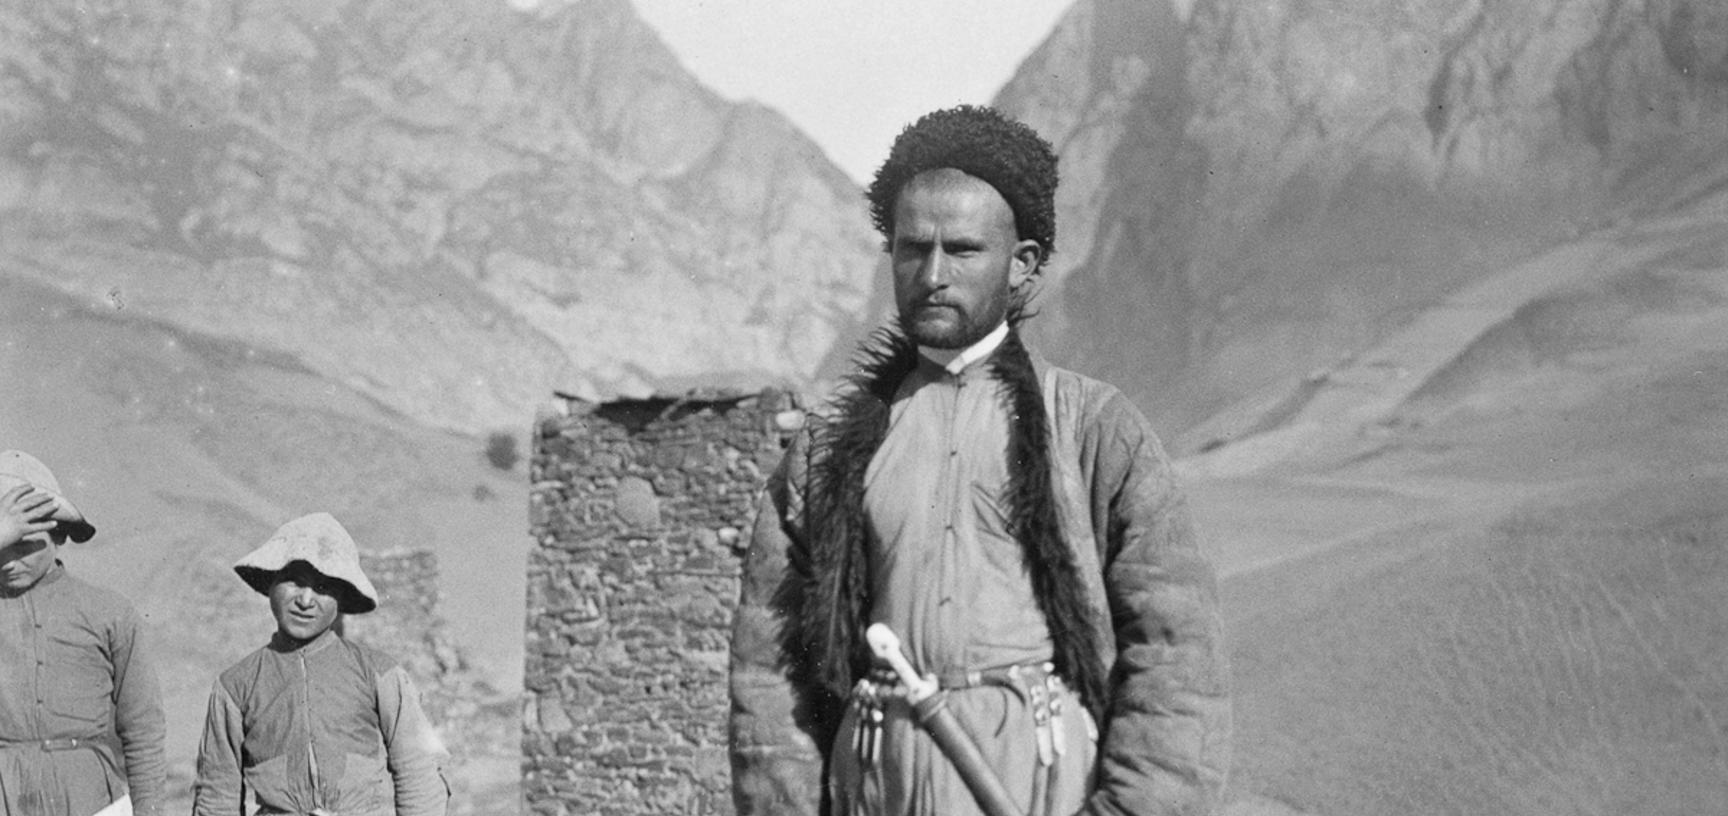 Man in the mountain village of Gornaya Saniba in the western Caucasus. Photograph by John Baddeley. Gornaya Saniba, Republic of North Ossetia-Alania, Russia. August 1902.